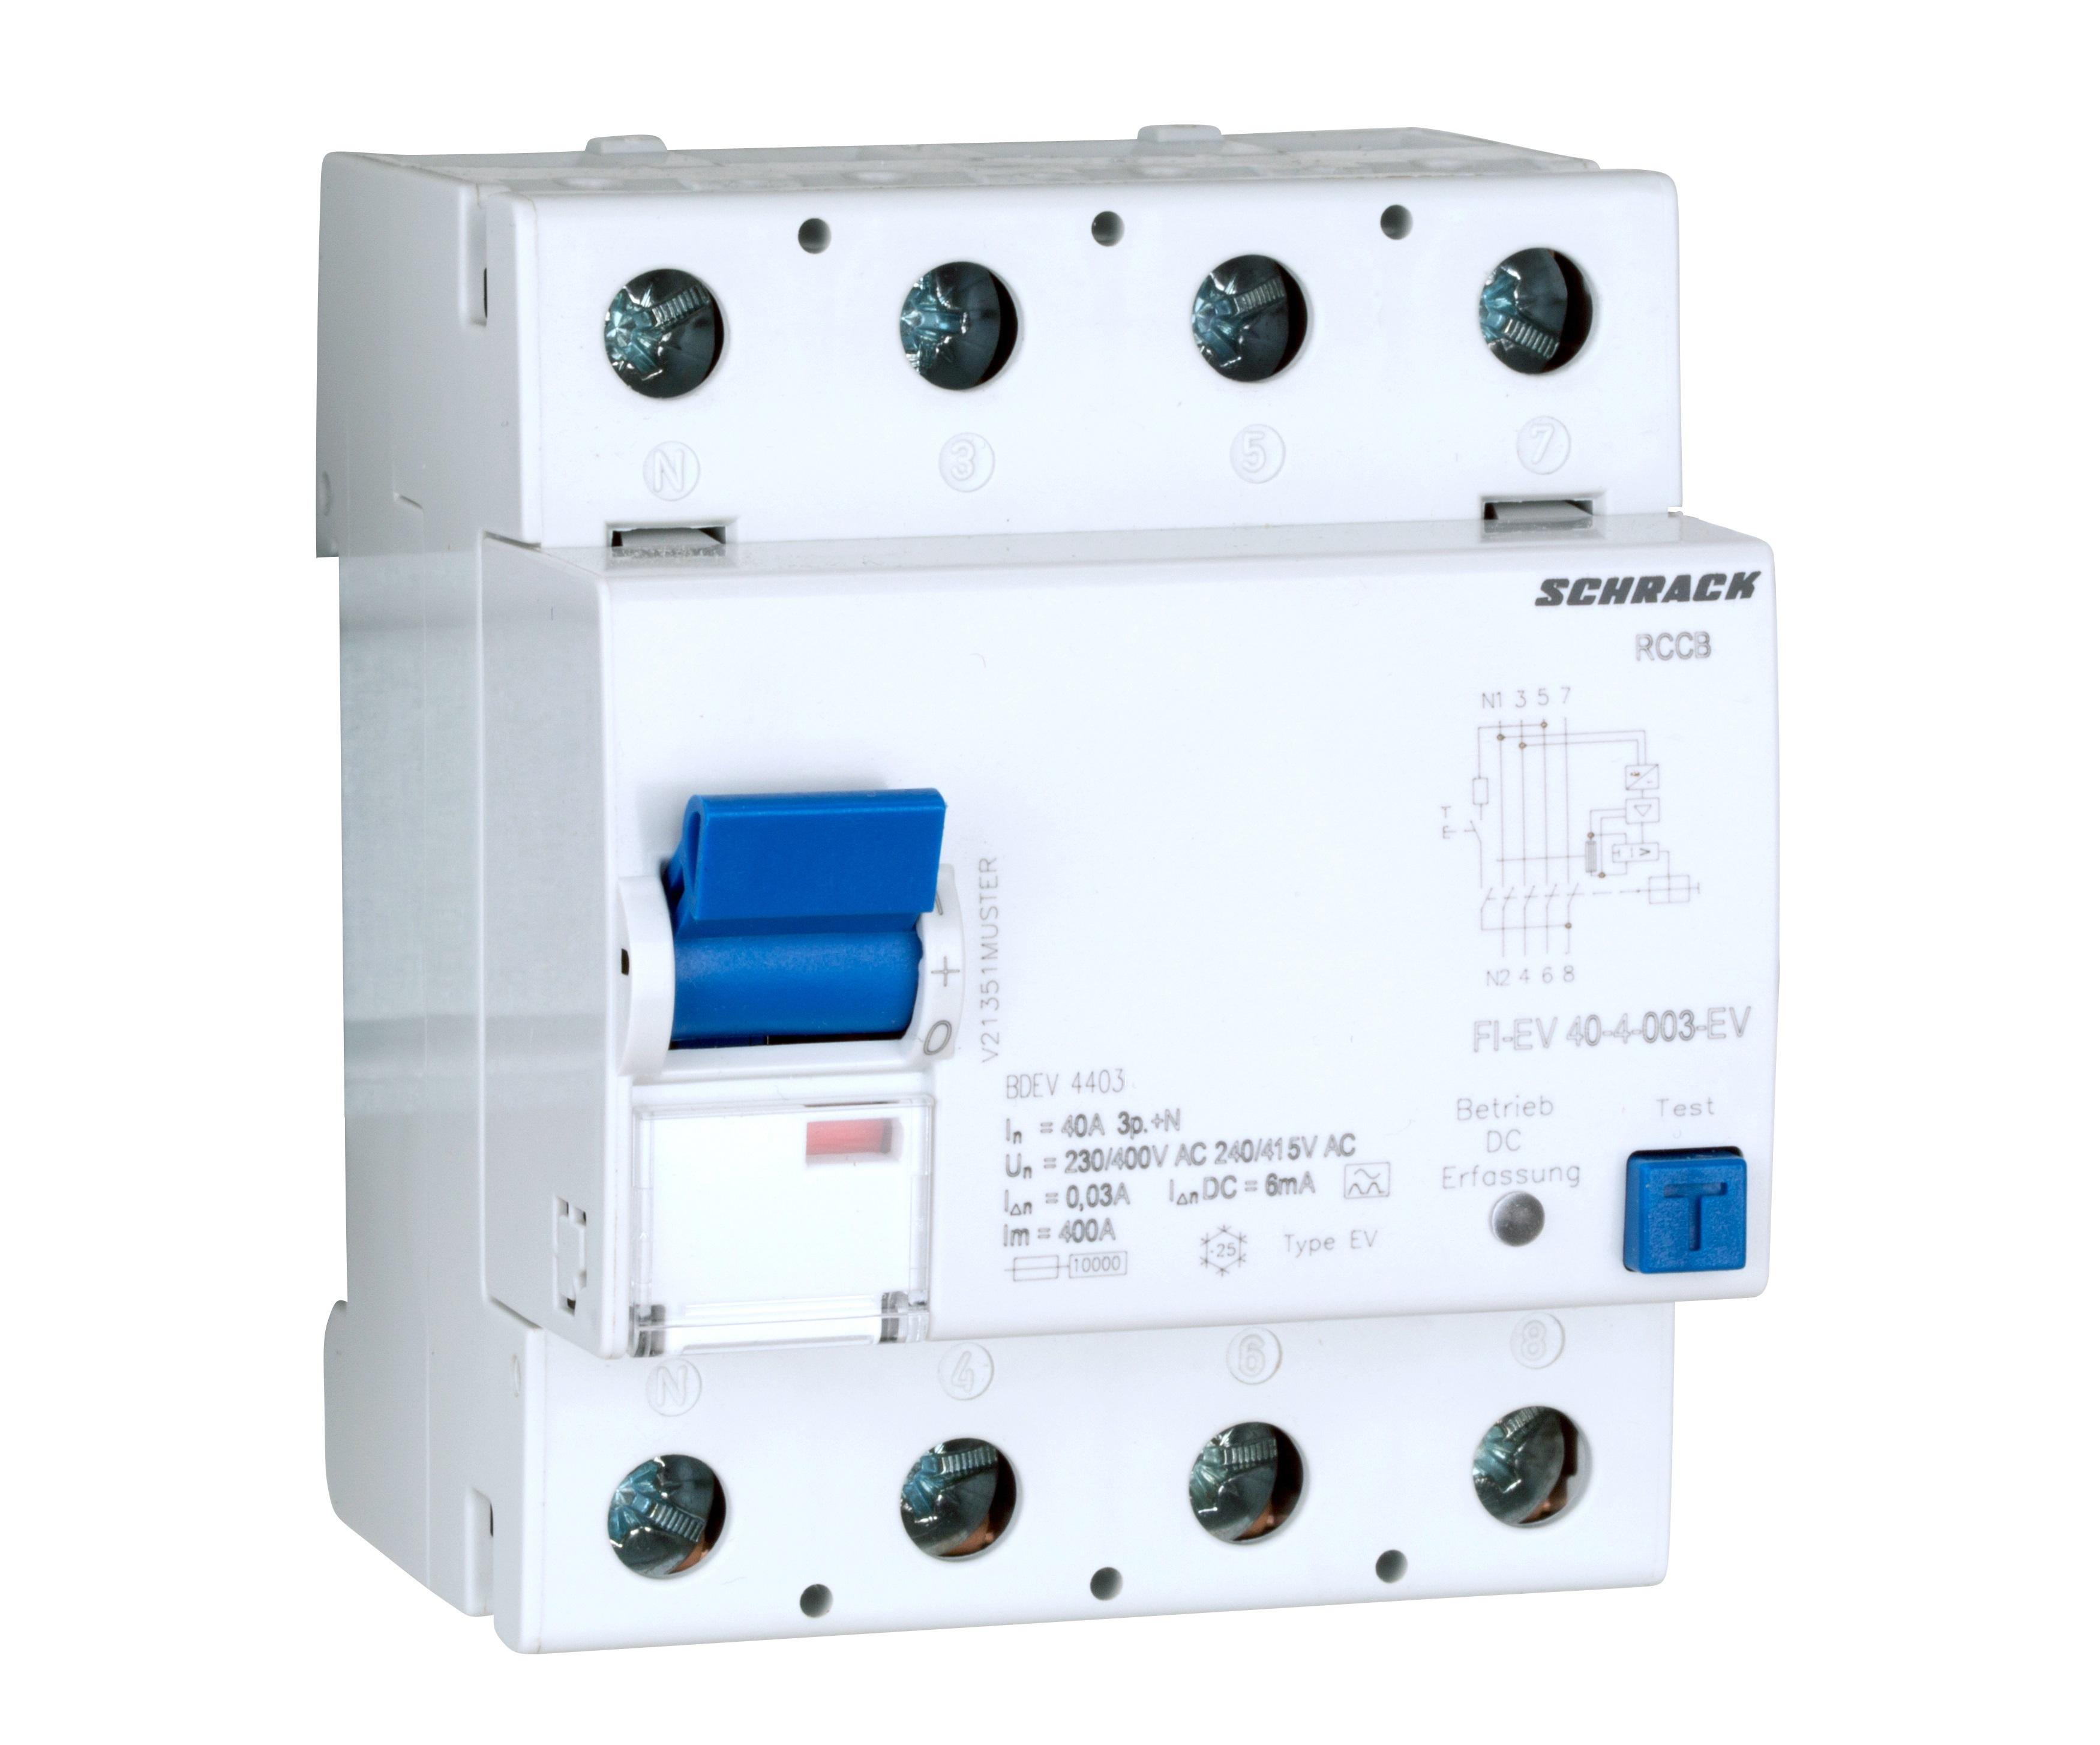 1 Stk FI-Schalter 40A, 4-polig, 30mA, Typ EV, für Elektrofahrzeuge BDEV4403--